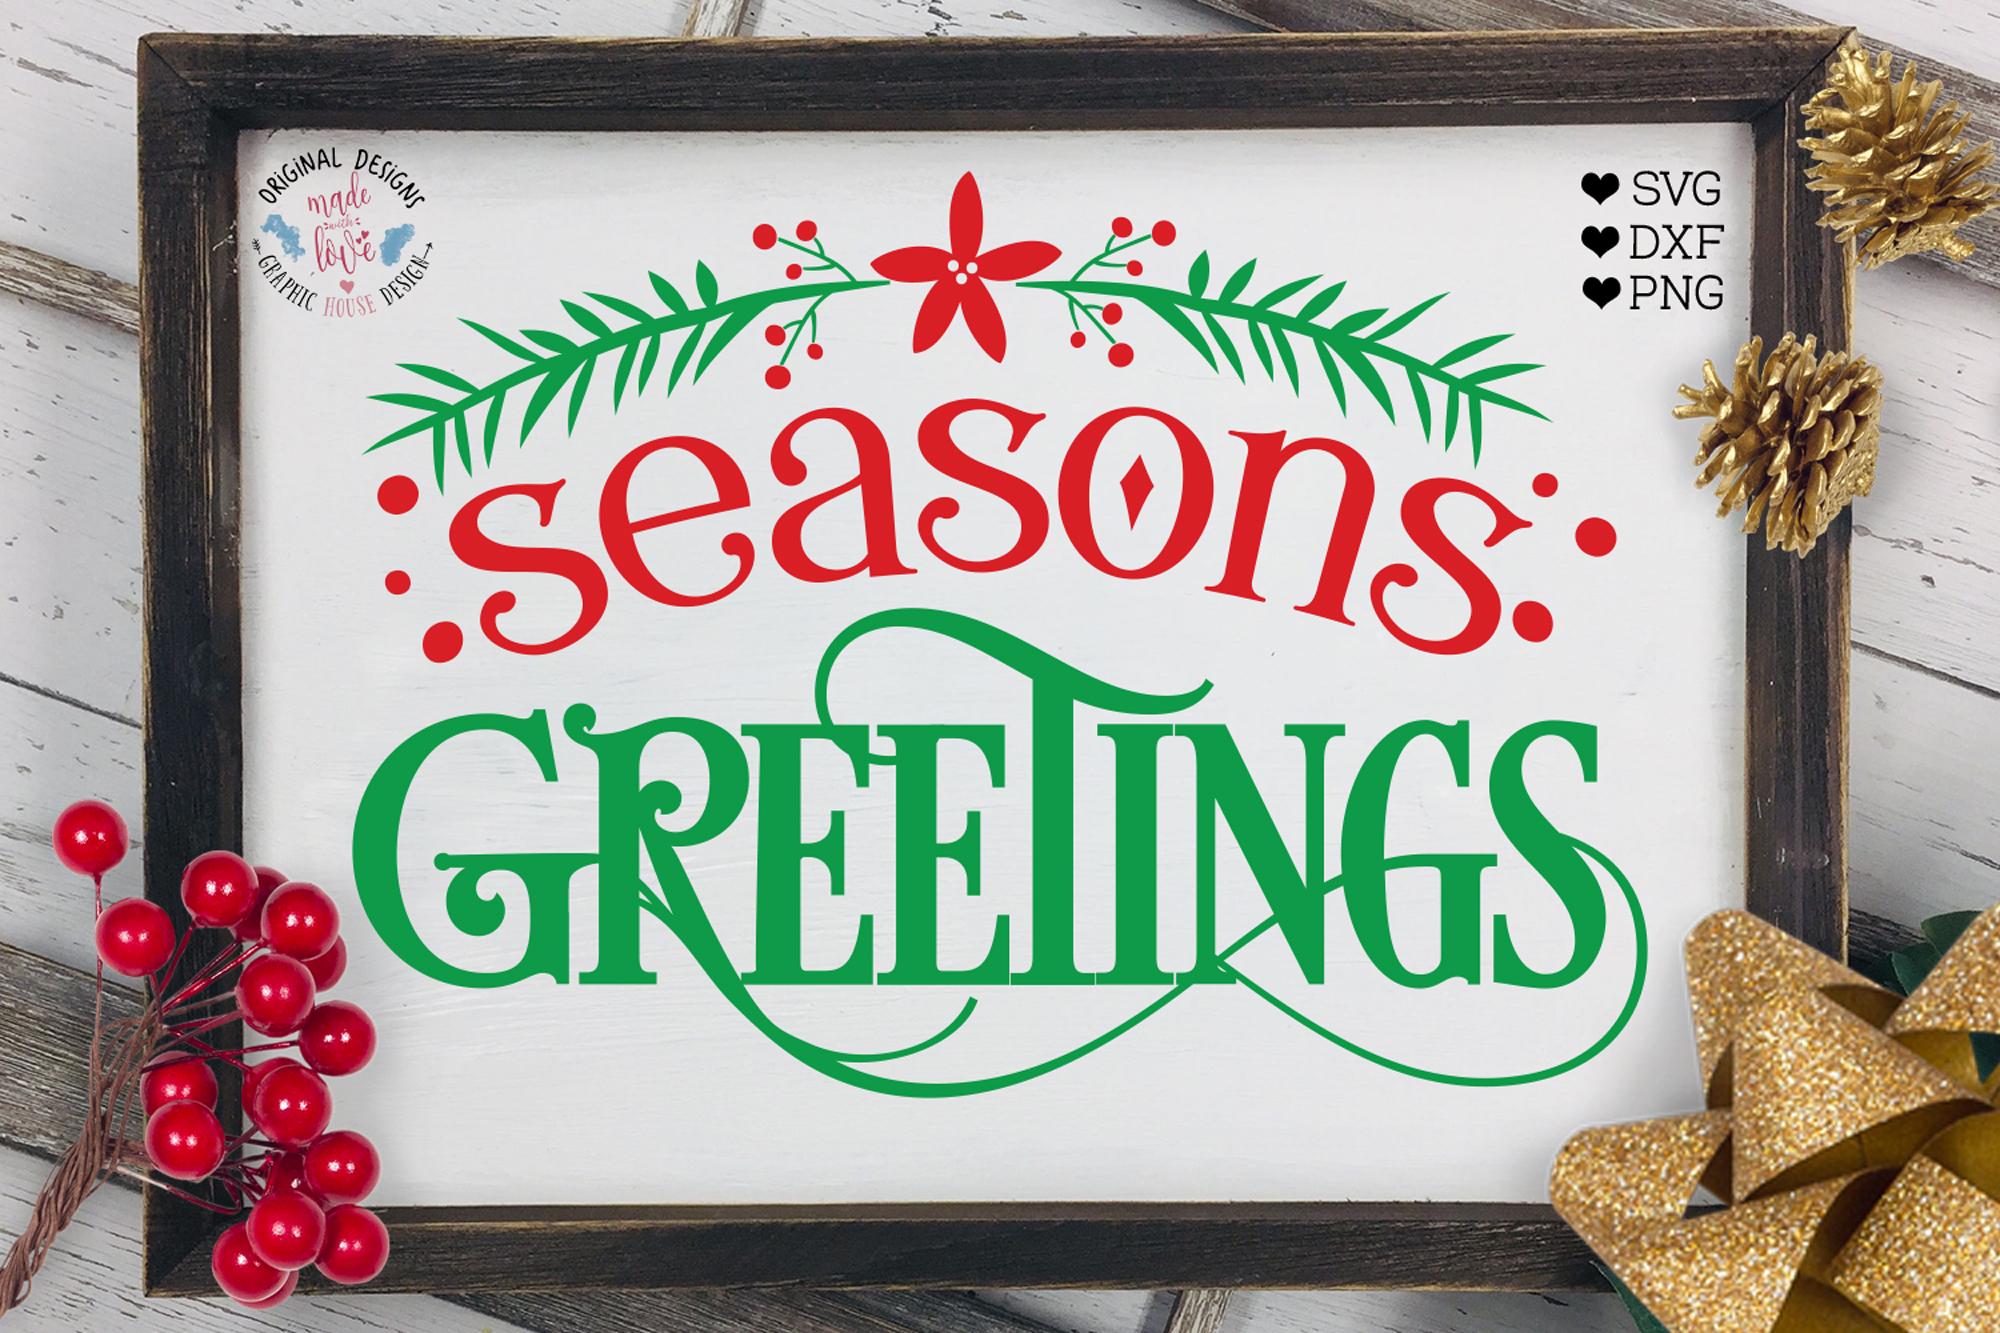 Seasons Greetings - Christmas Home Decor Cut File example image 1